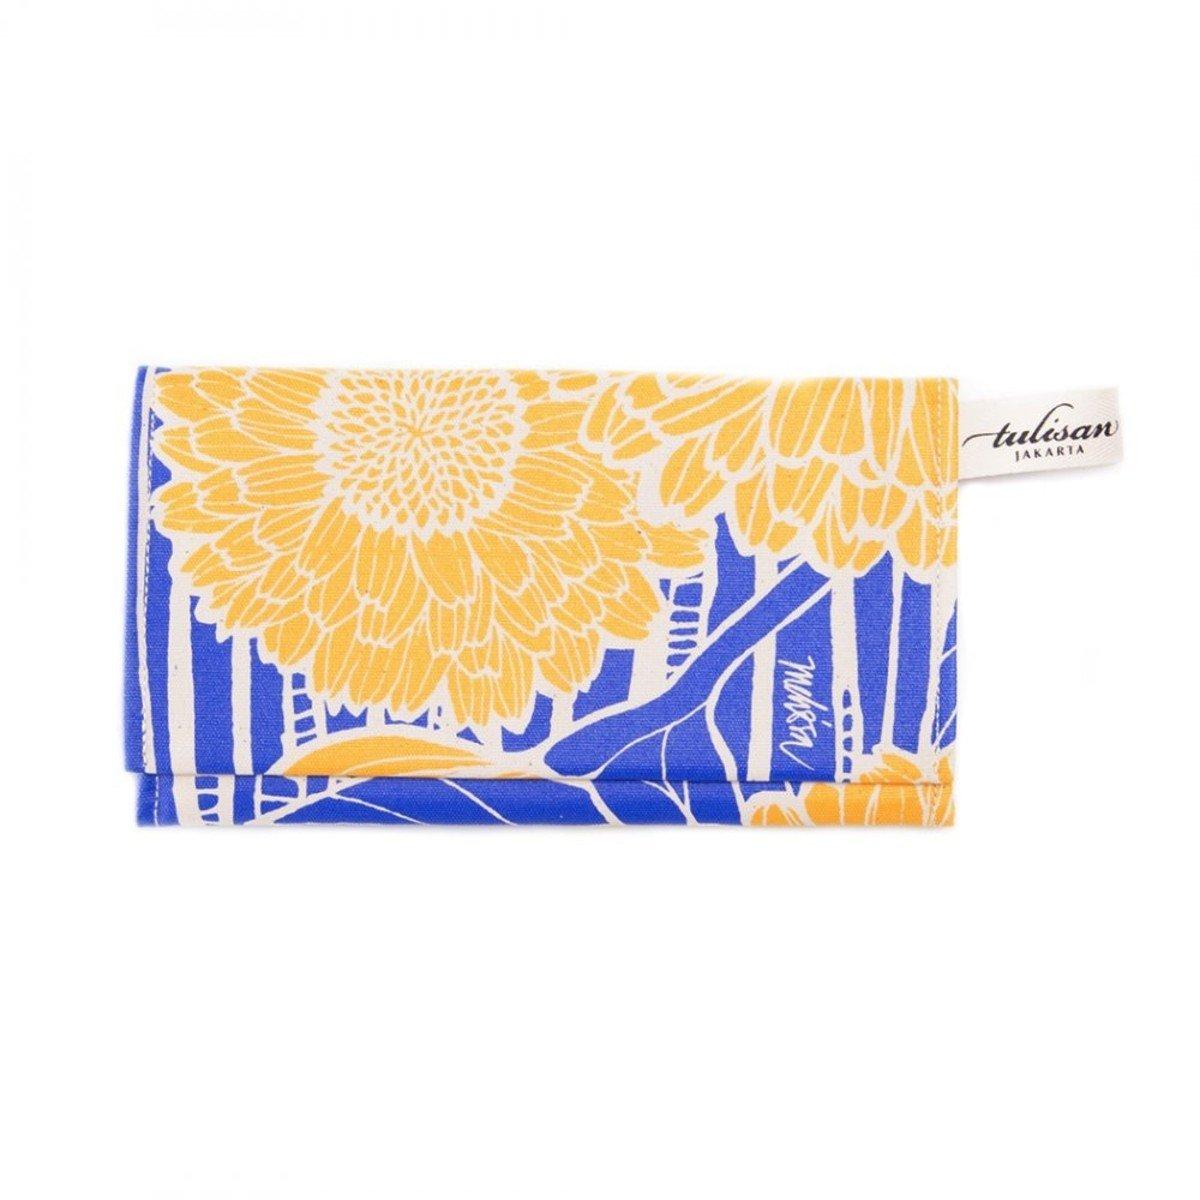 Olio Clutch 錢包 - Yellow Sunflower